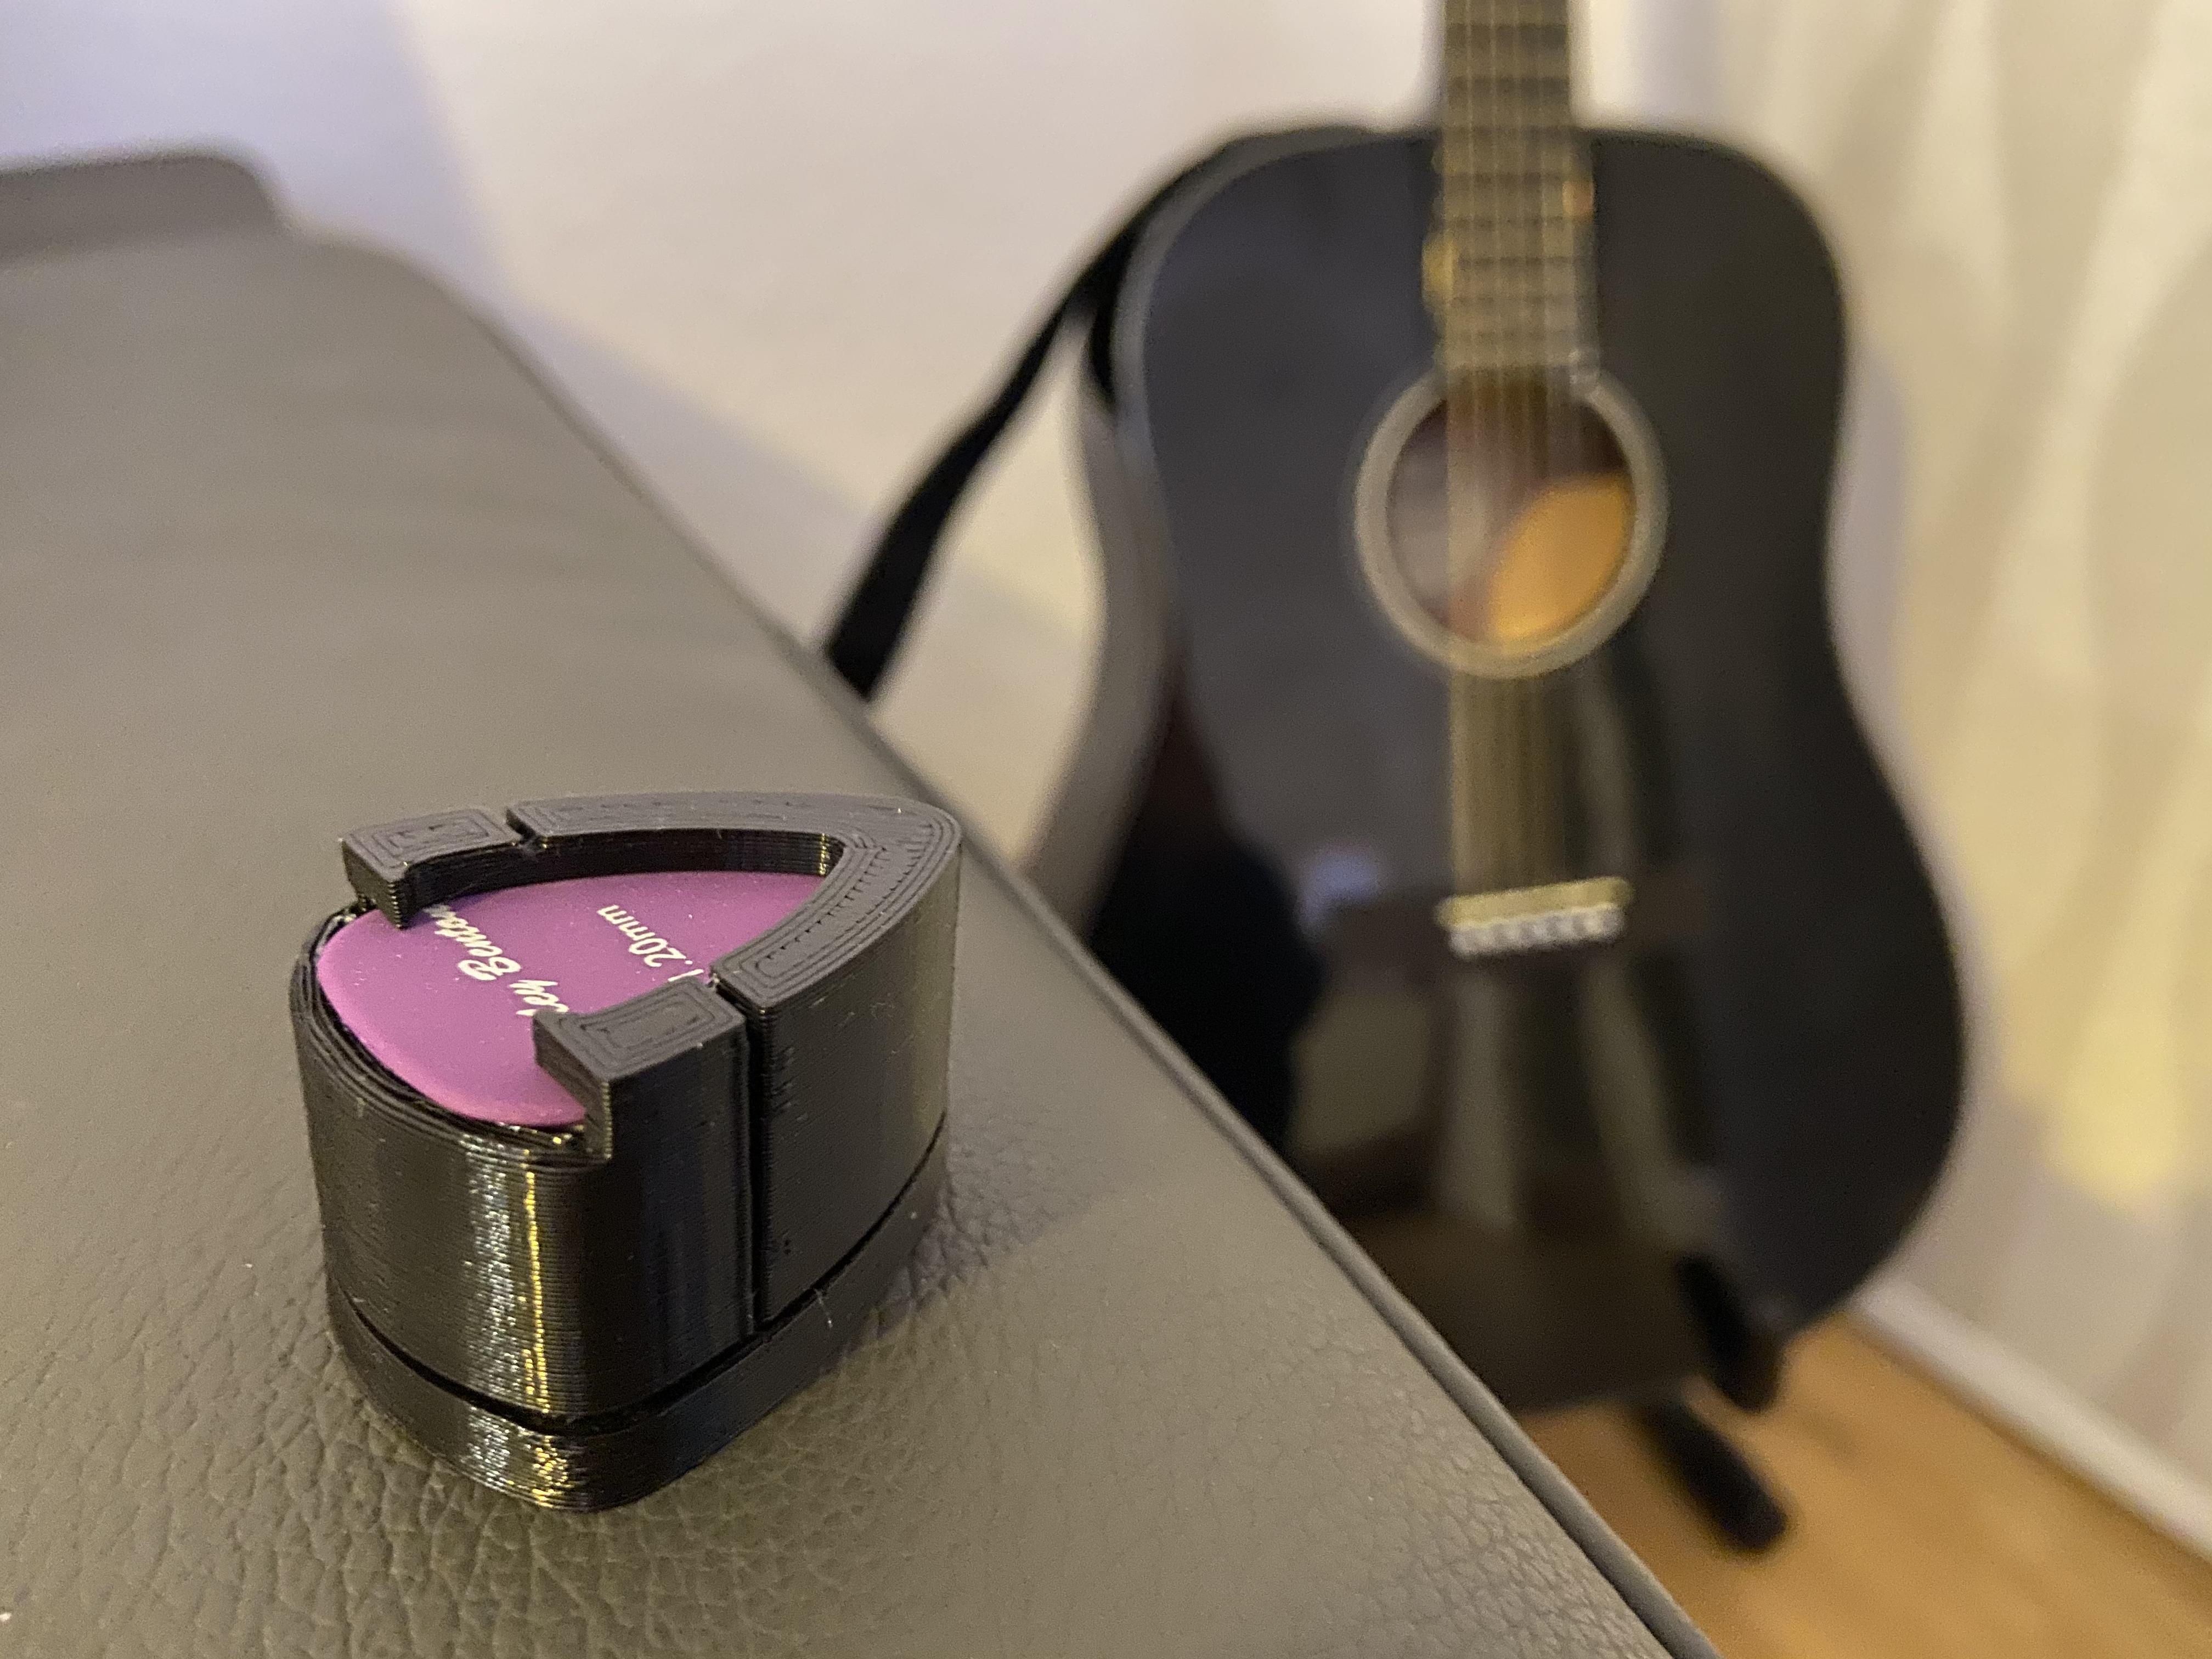 Gitar Pena  Tutucu Kabı Kutusu